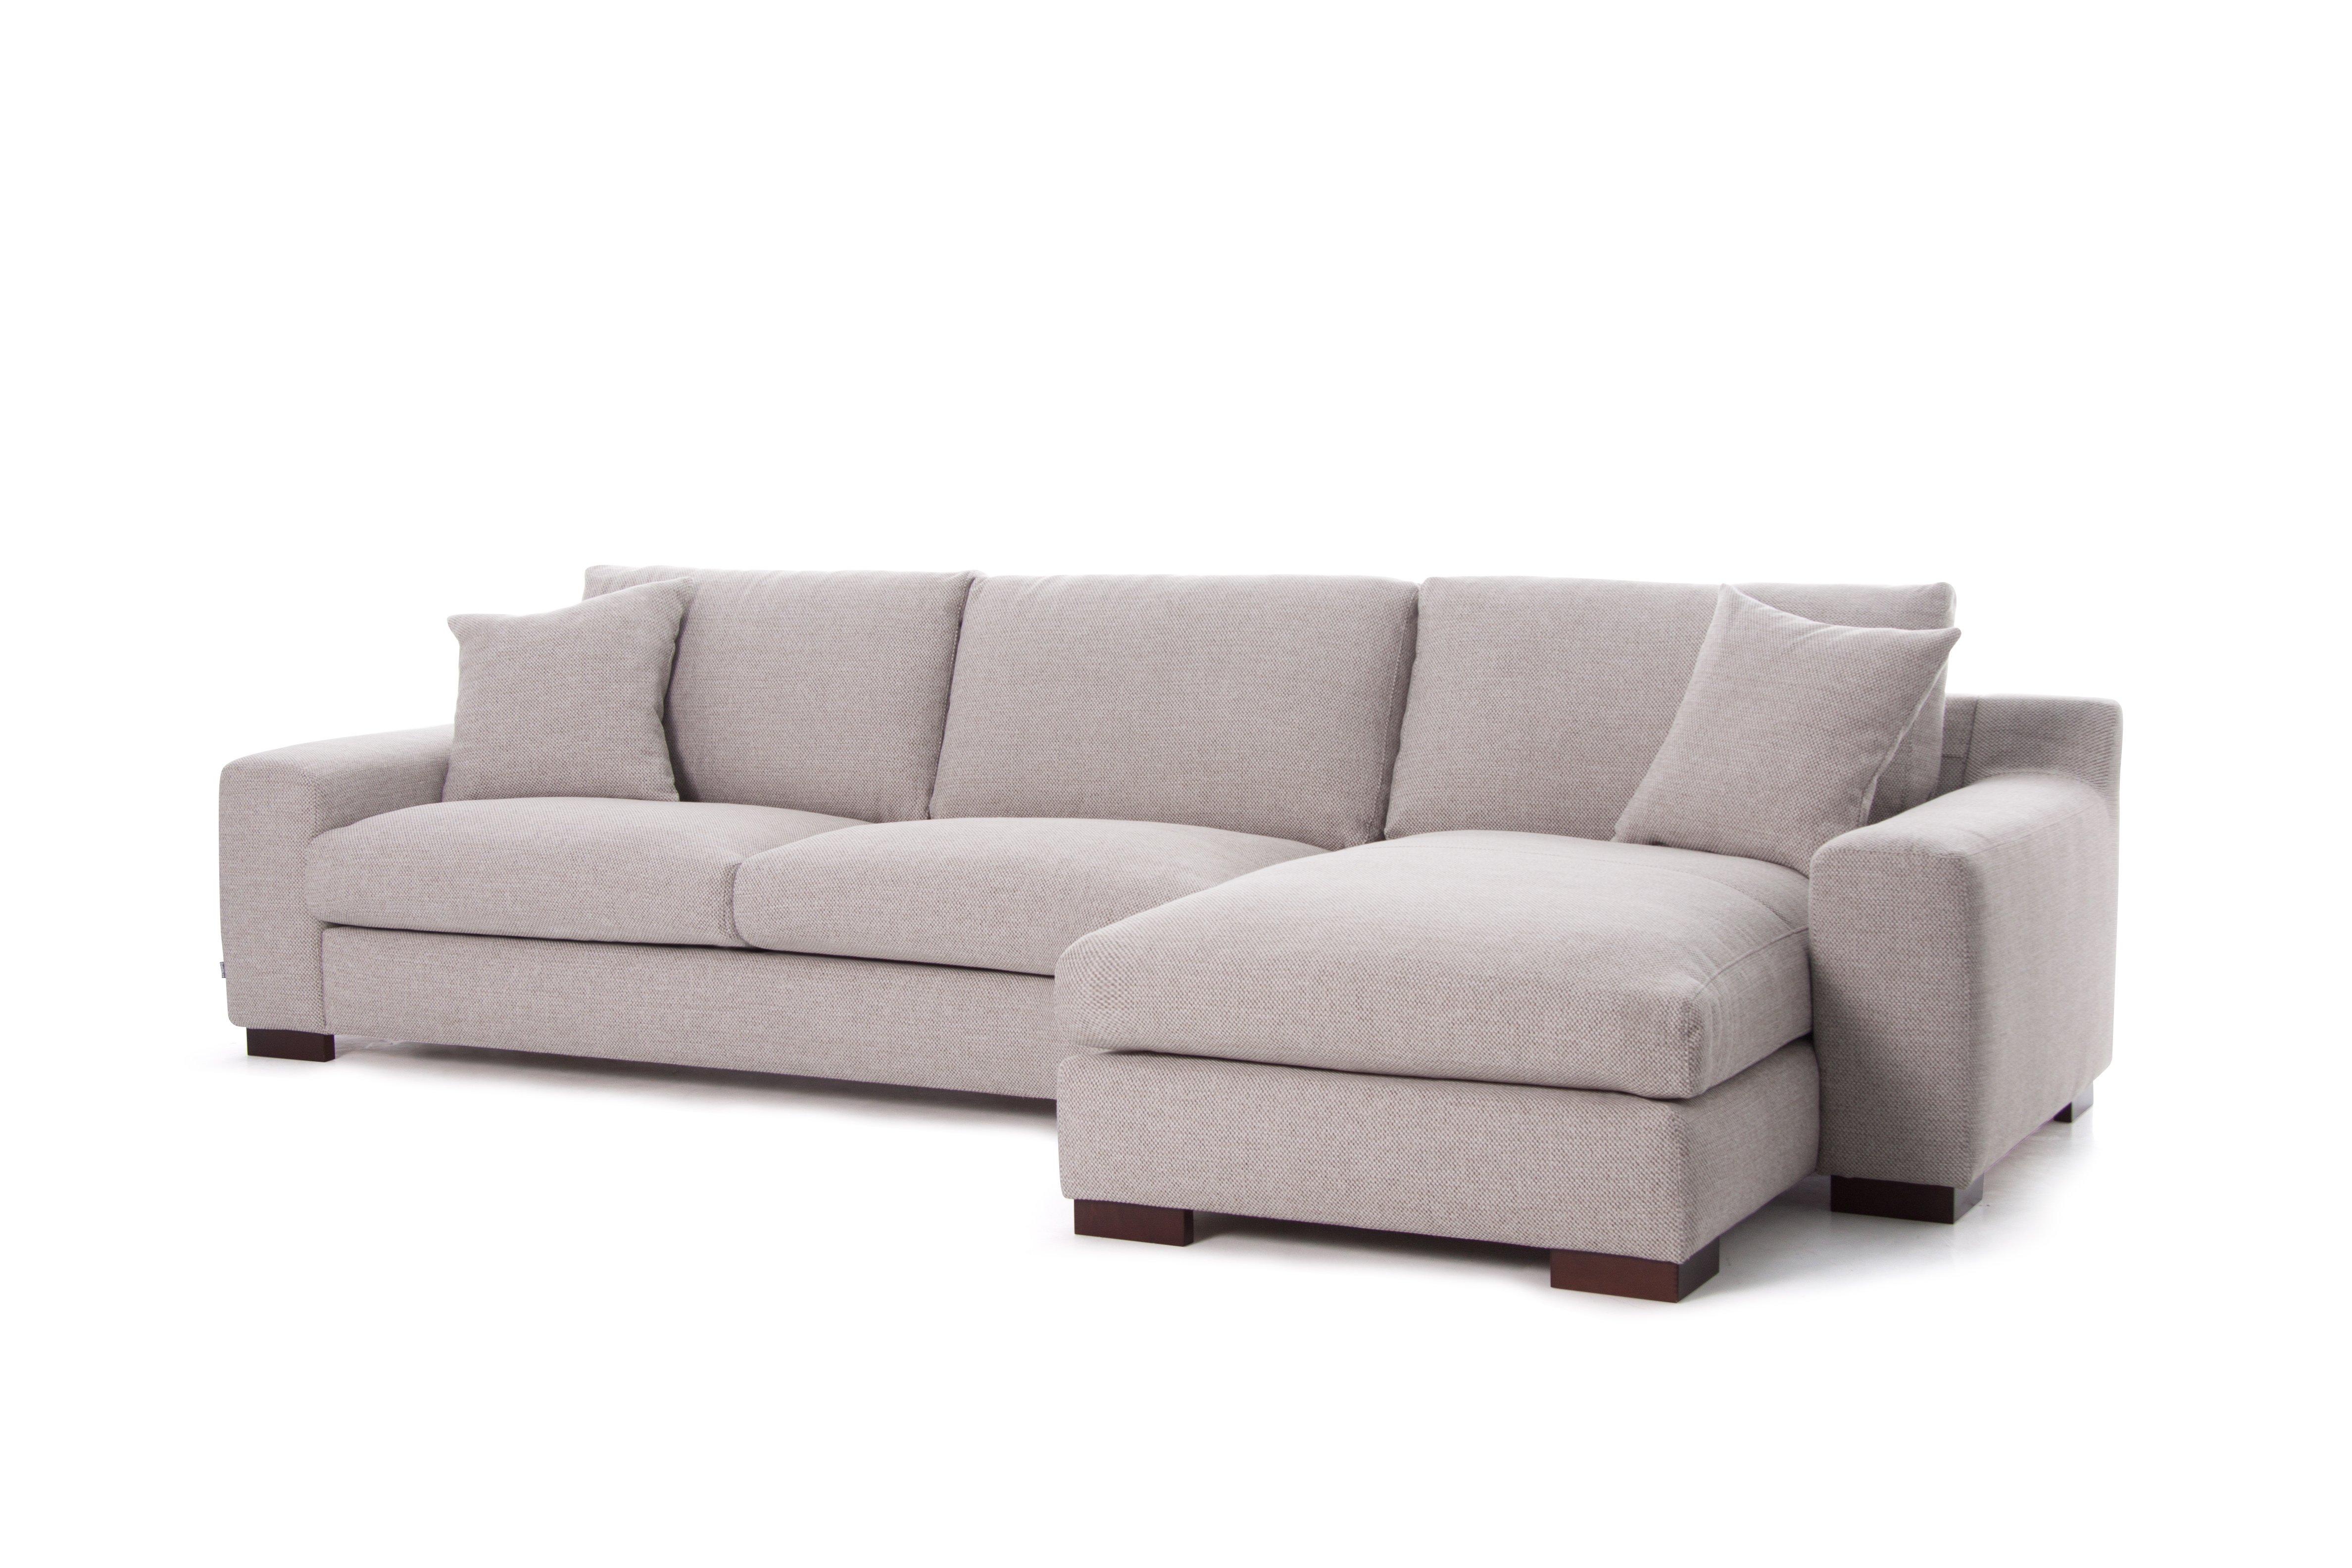 desiree furniture. Desiree_hq Desiree Furniture A